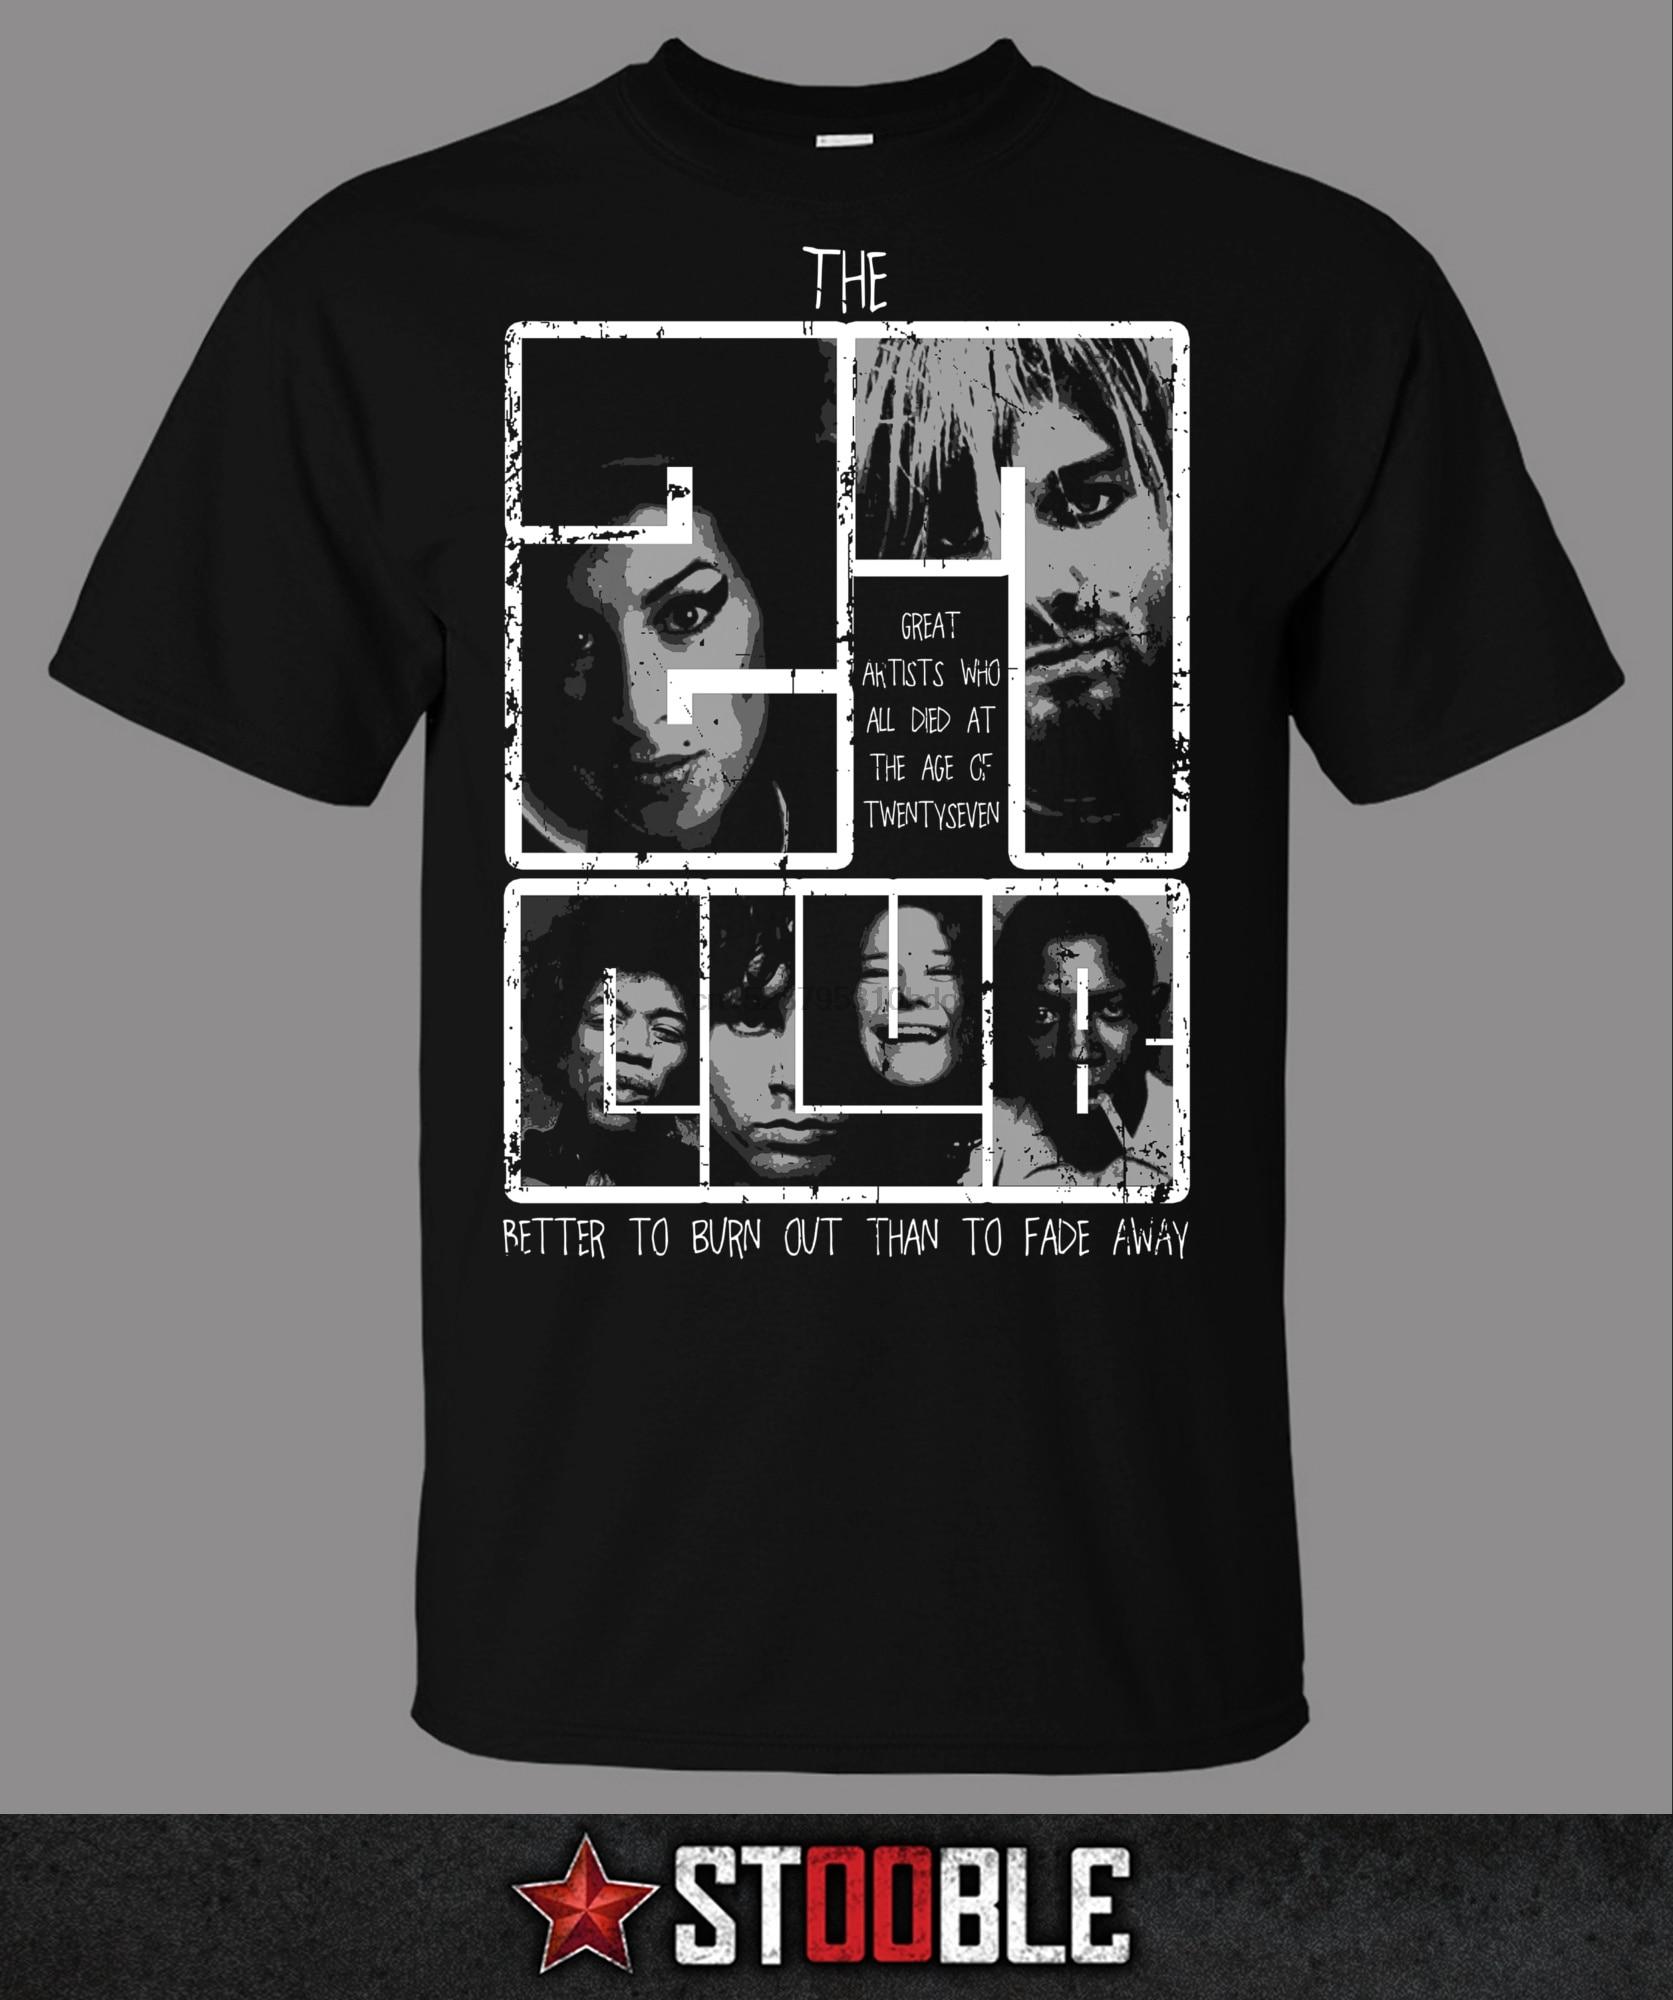 5XL jimi hendrix jim morrison cobain joplin nirvana doors 27 CLUB t-shirt S